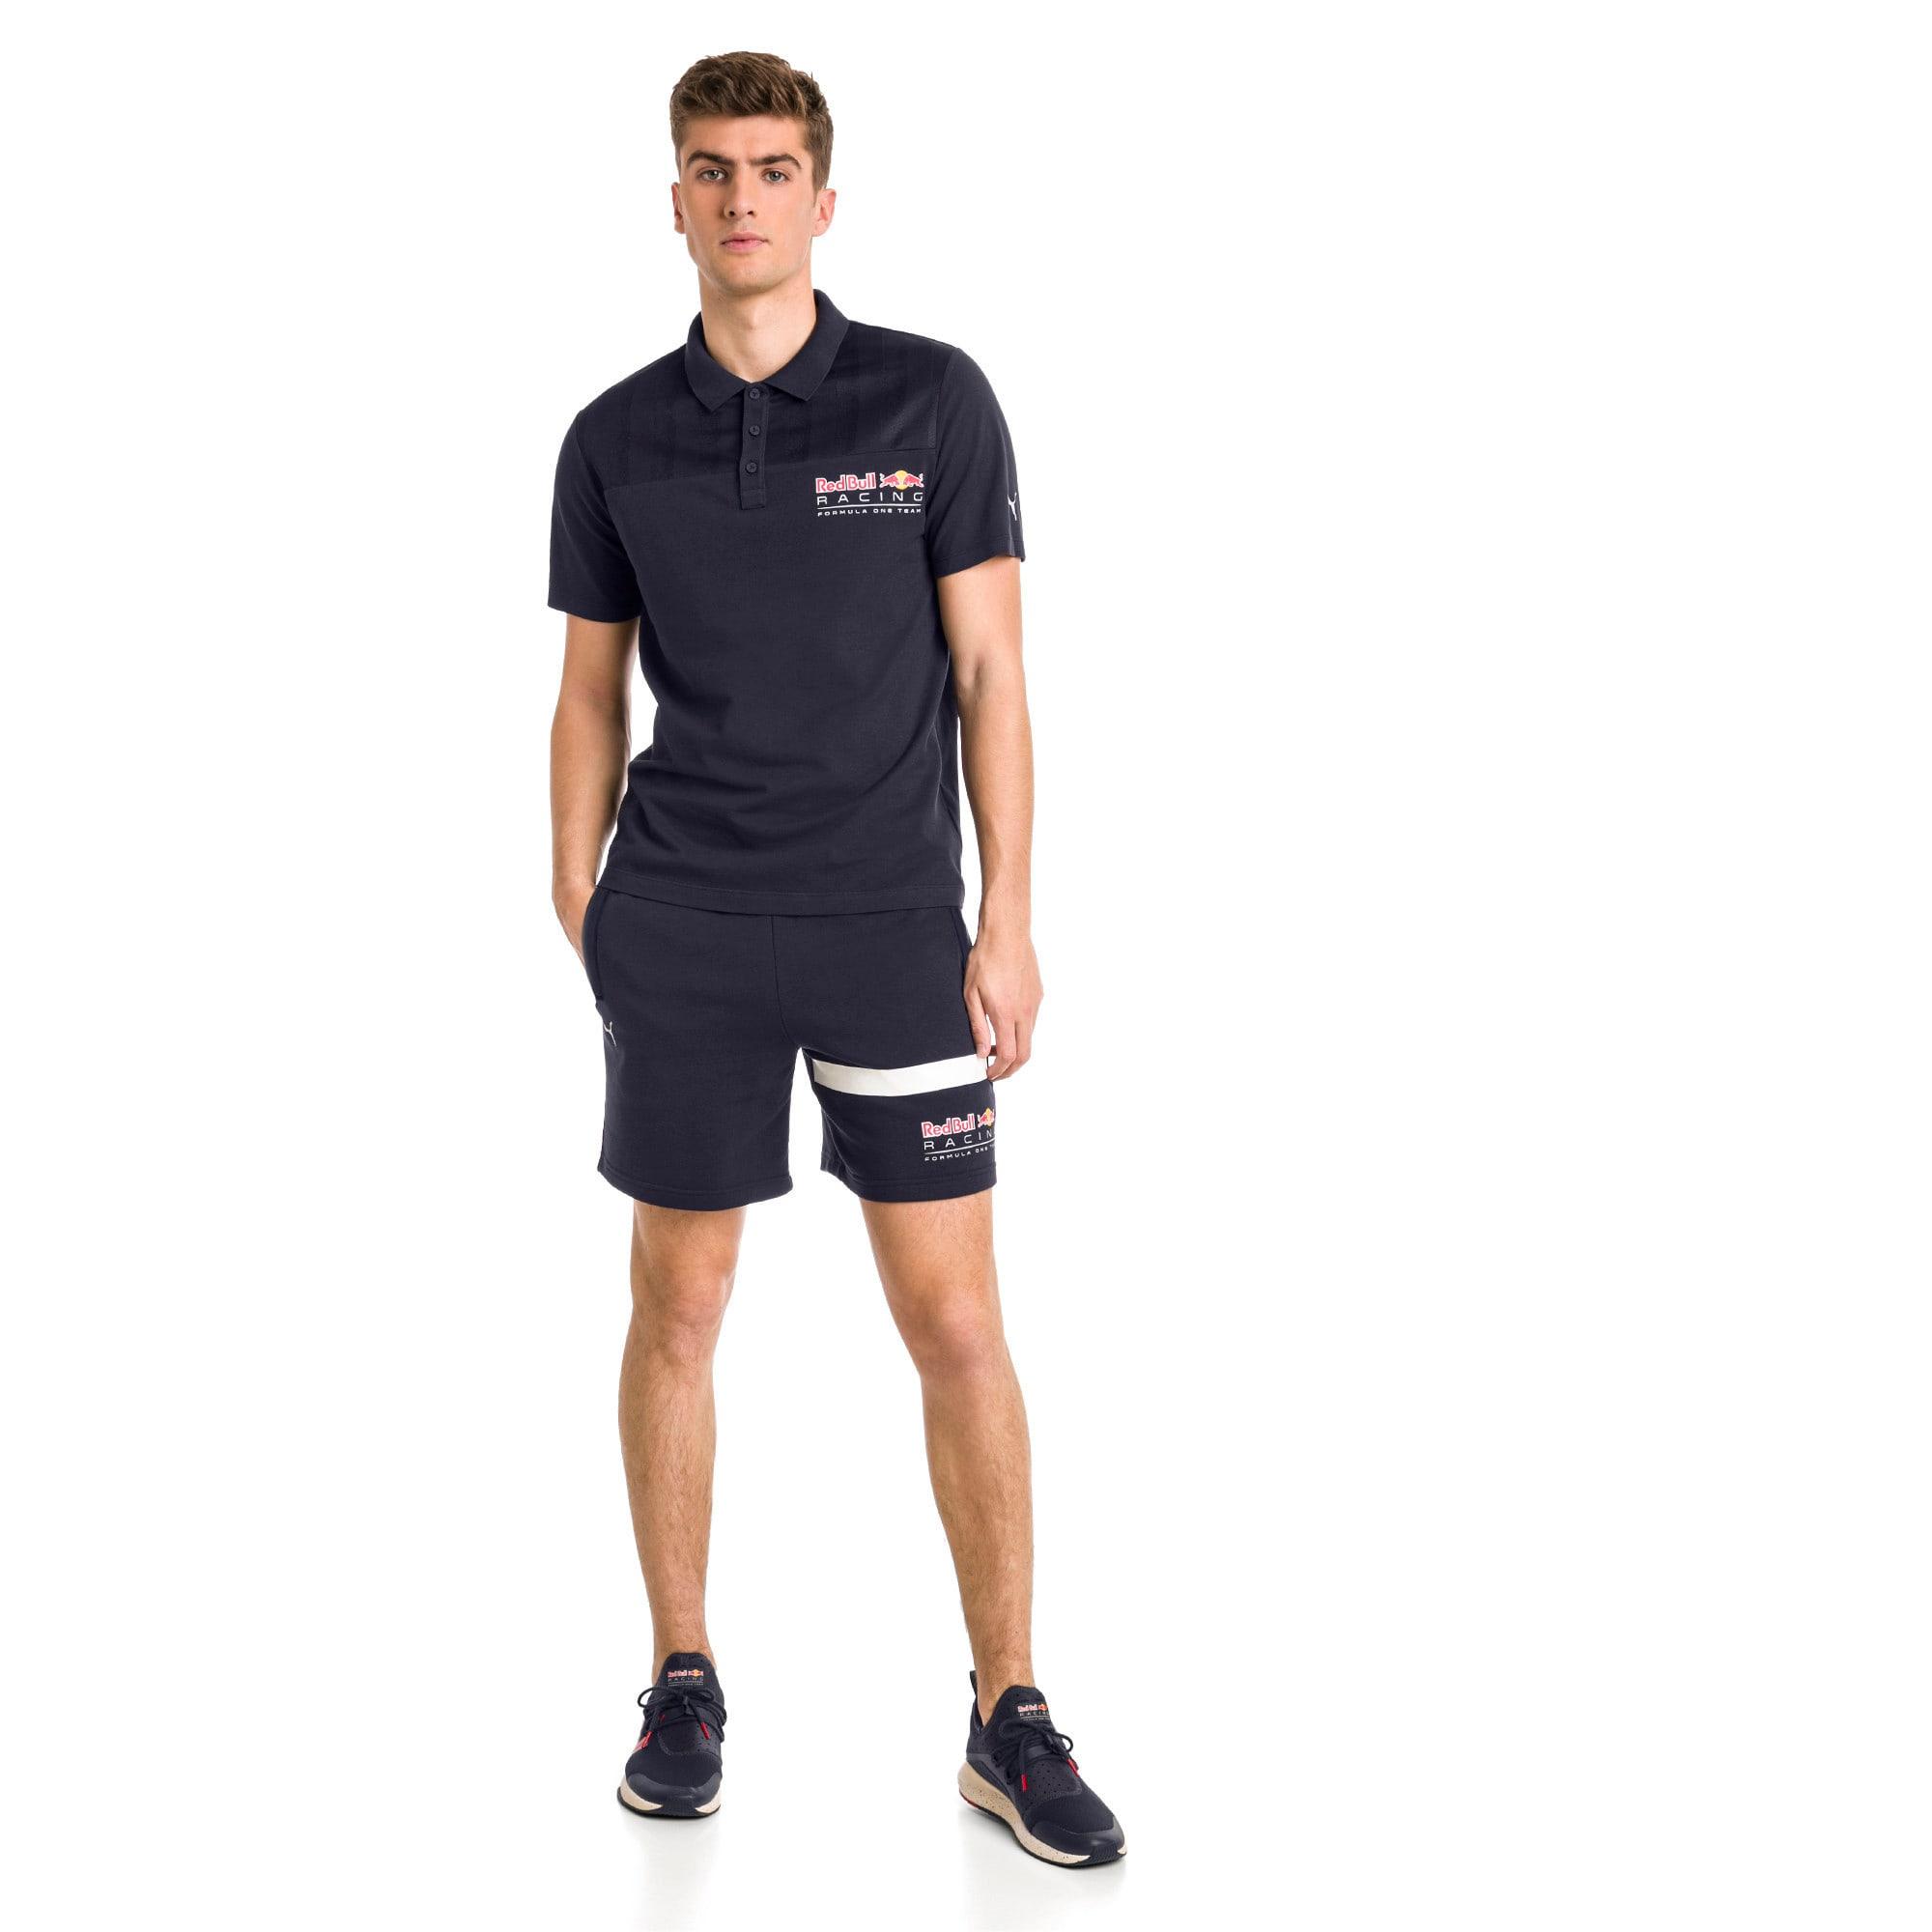 Thumbnail 2 of Red Bull Racing Logo Men's Sweat Shorts, NIGHT SKY, medium-IND